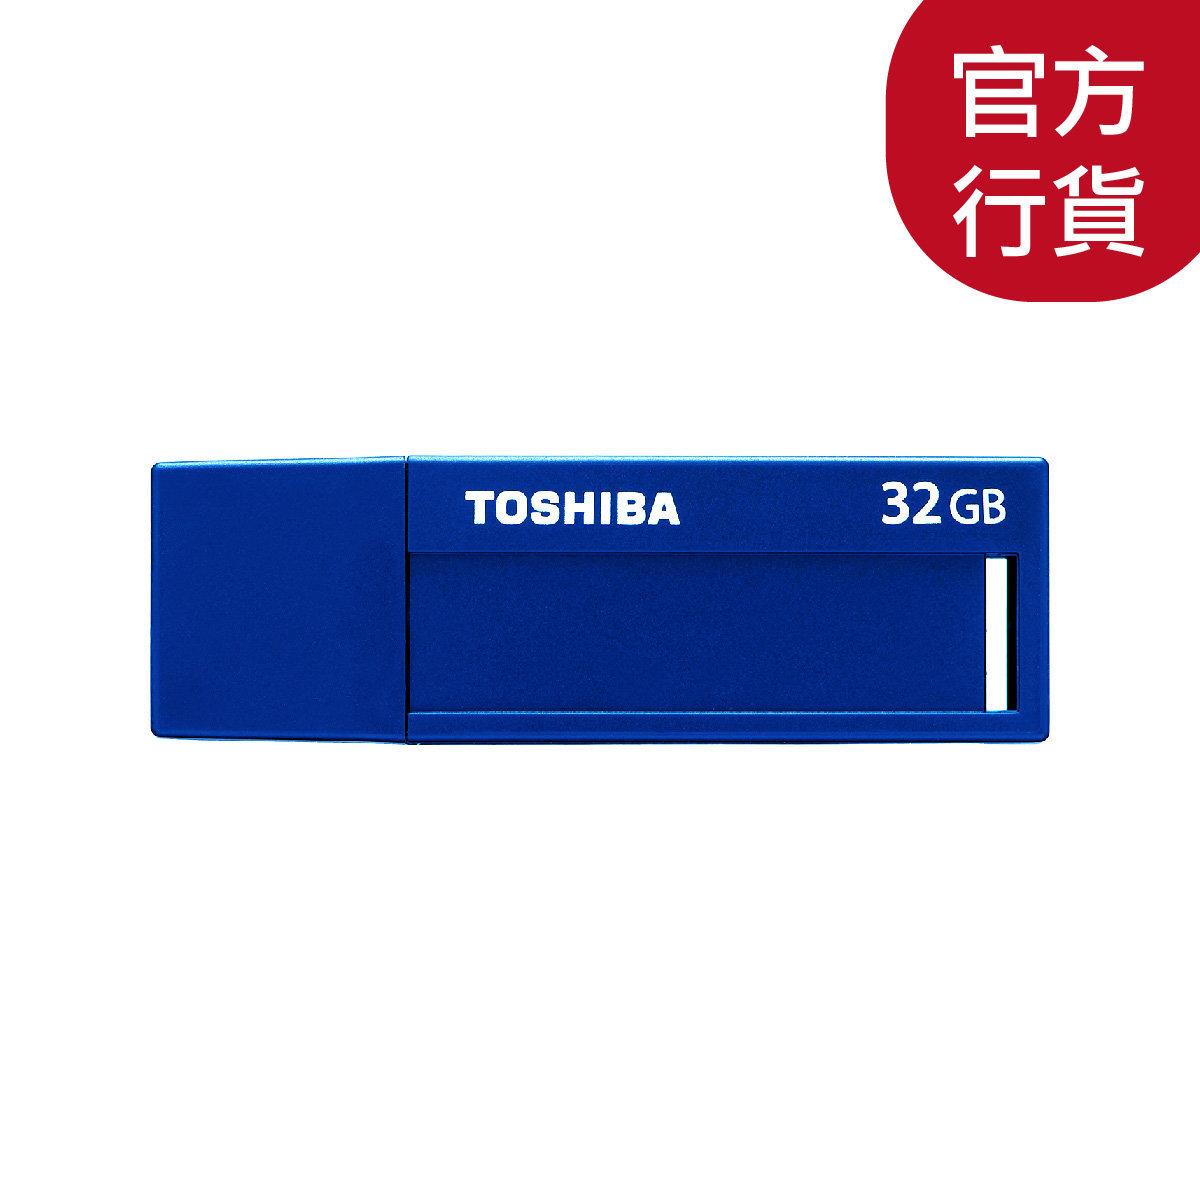 32GB TransMemory™ V3DCH USB3.0 Memory Stick Label Blue